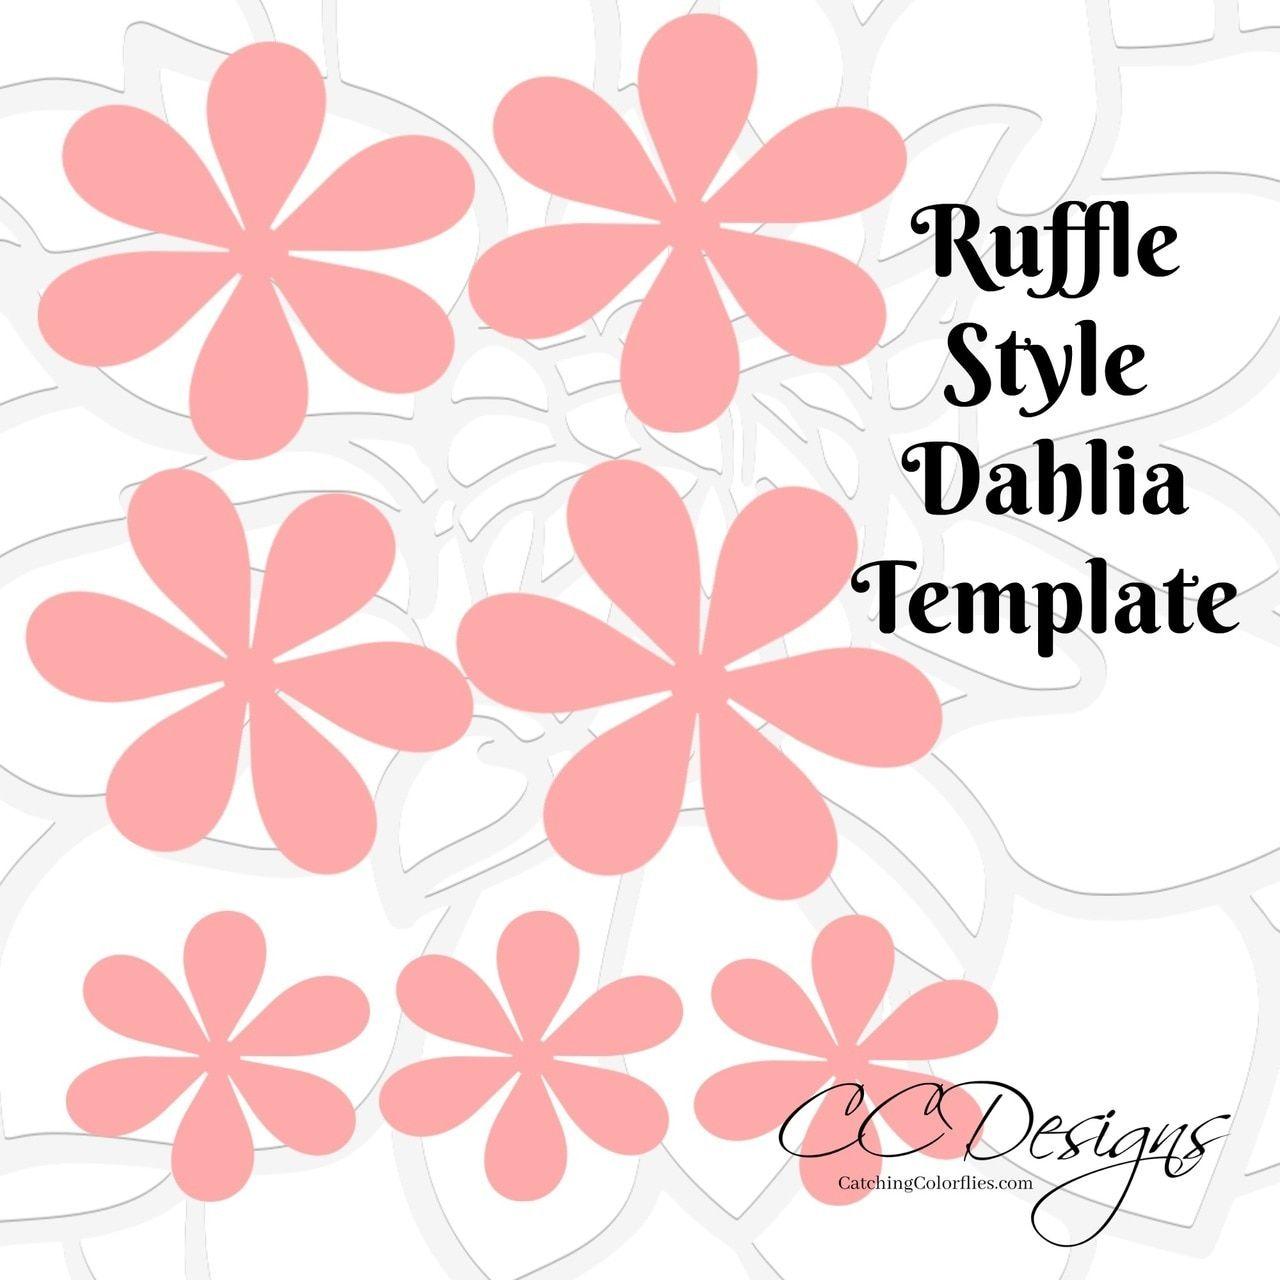 Ruffle Dahlia Style Small Flower Template Flower Template Paper Flowers Diy Paper Dahlia